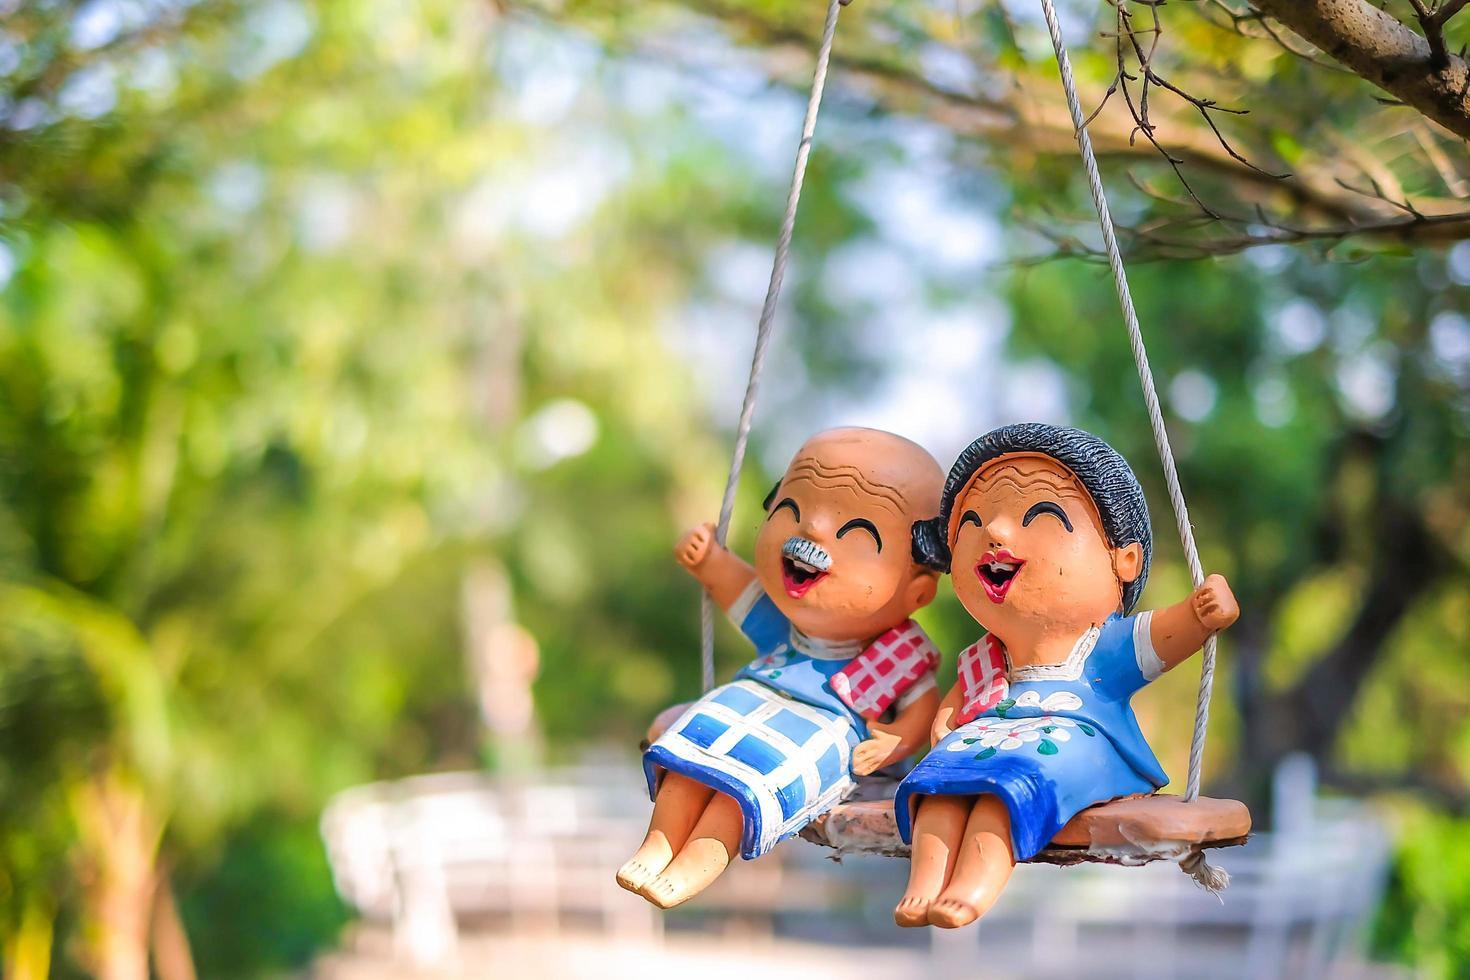 Spielzeugpaar schwingt in der Sonne foto